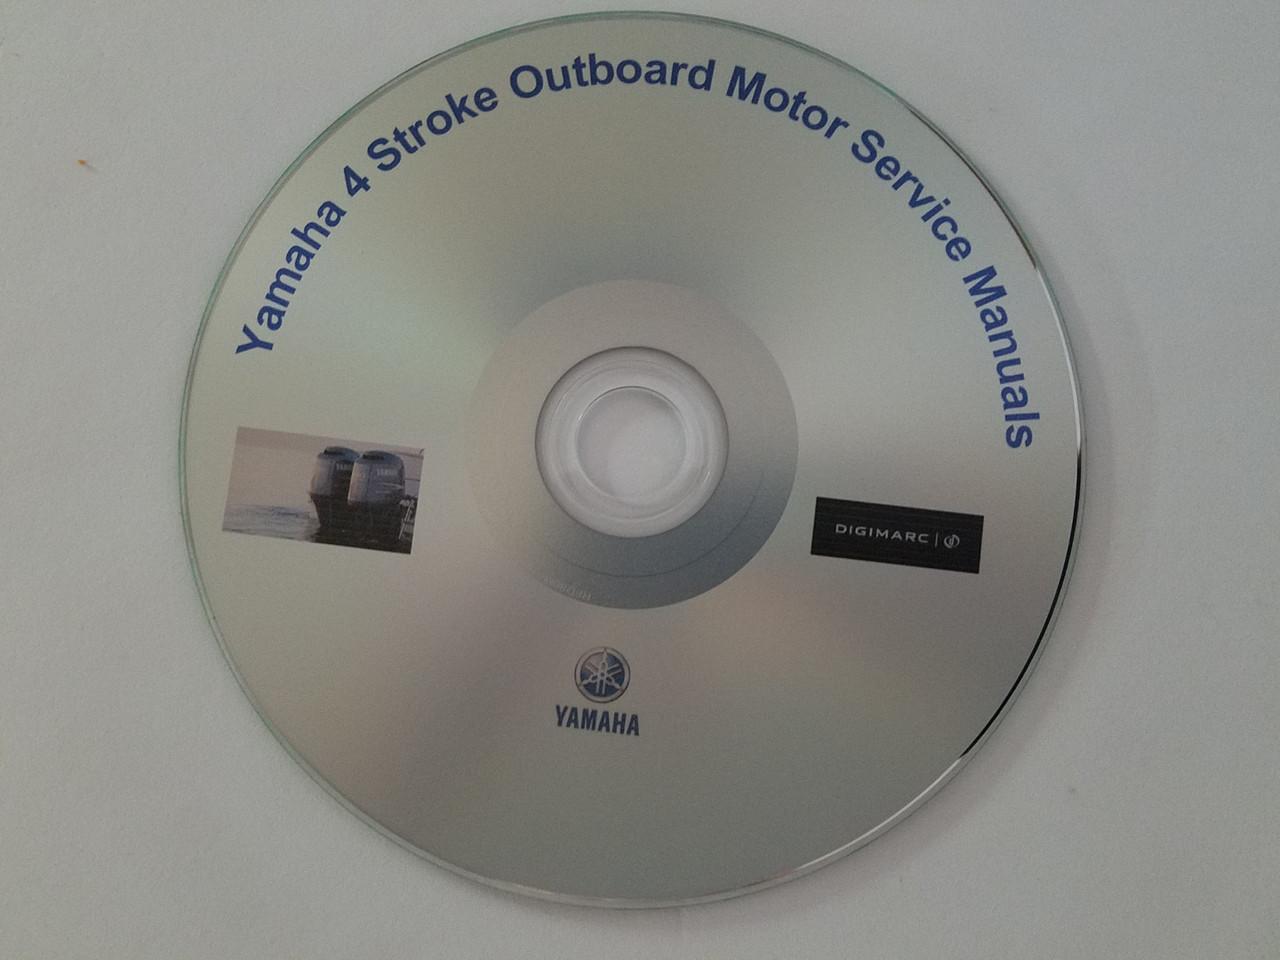 Yamaha Outboard motor service manuals